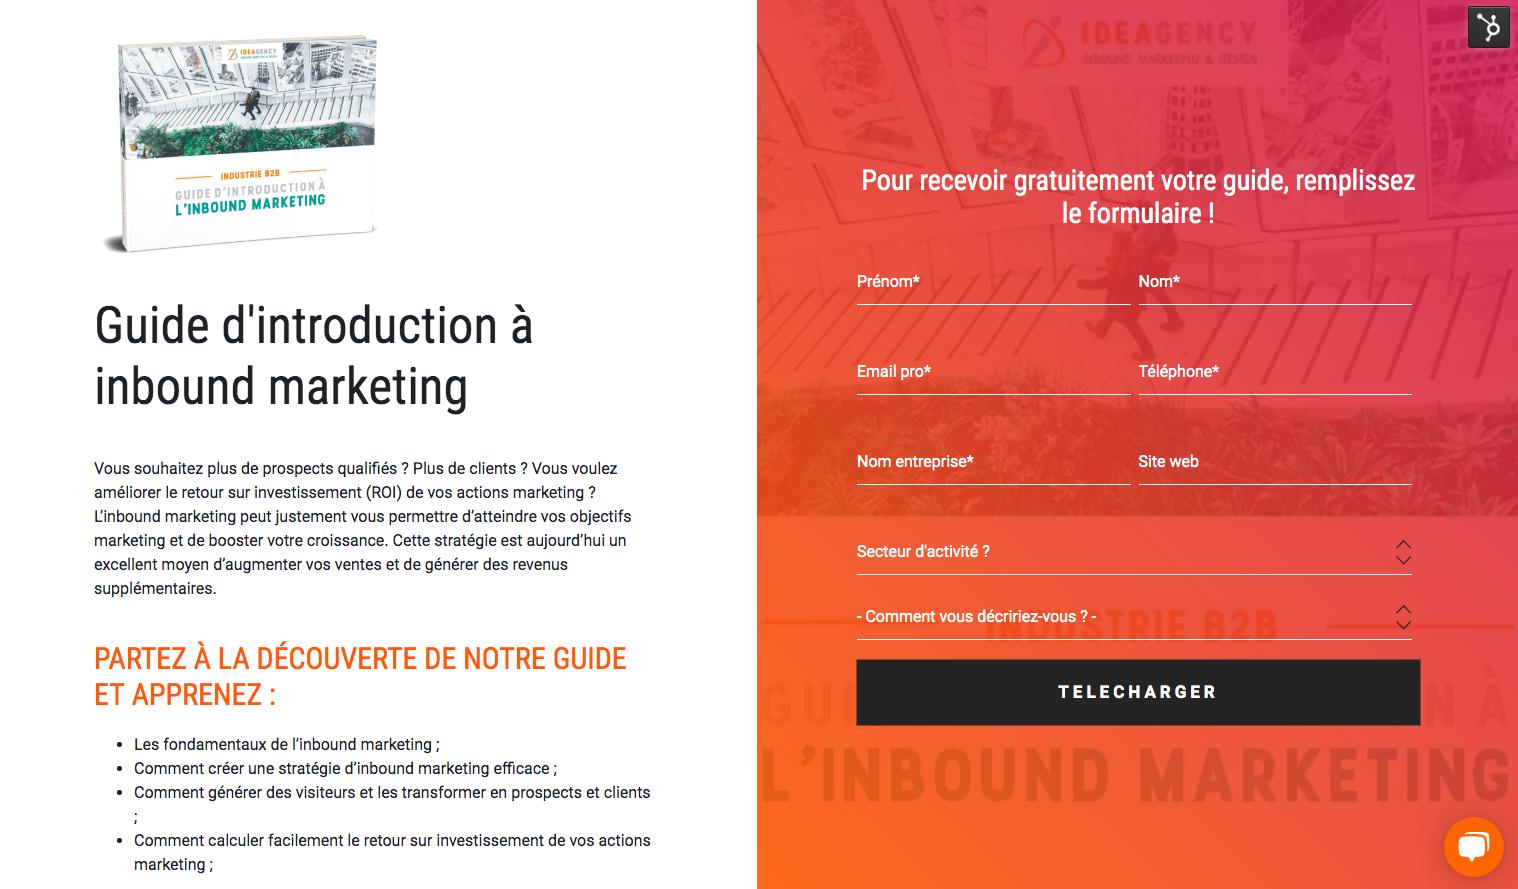 LP-guide-introduction-inbound-marketing